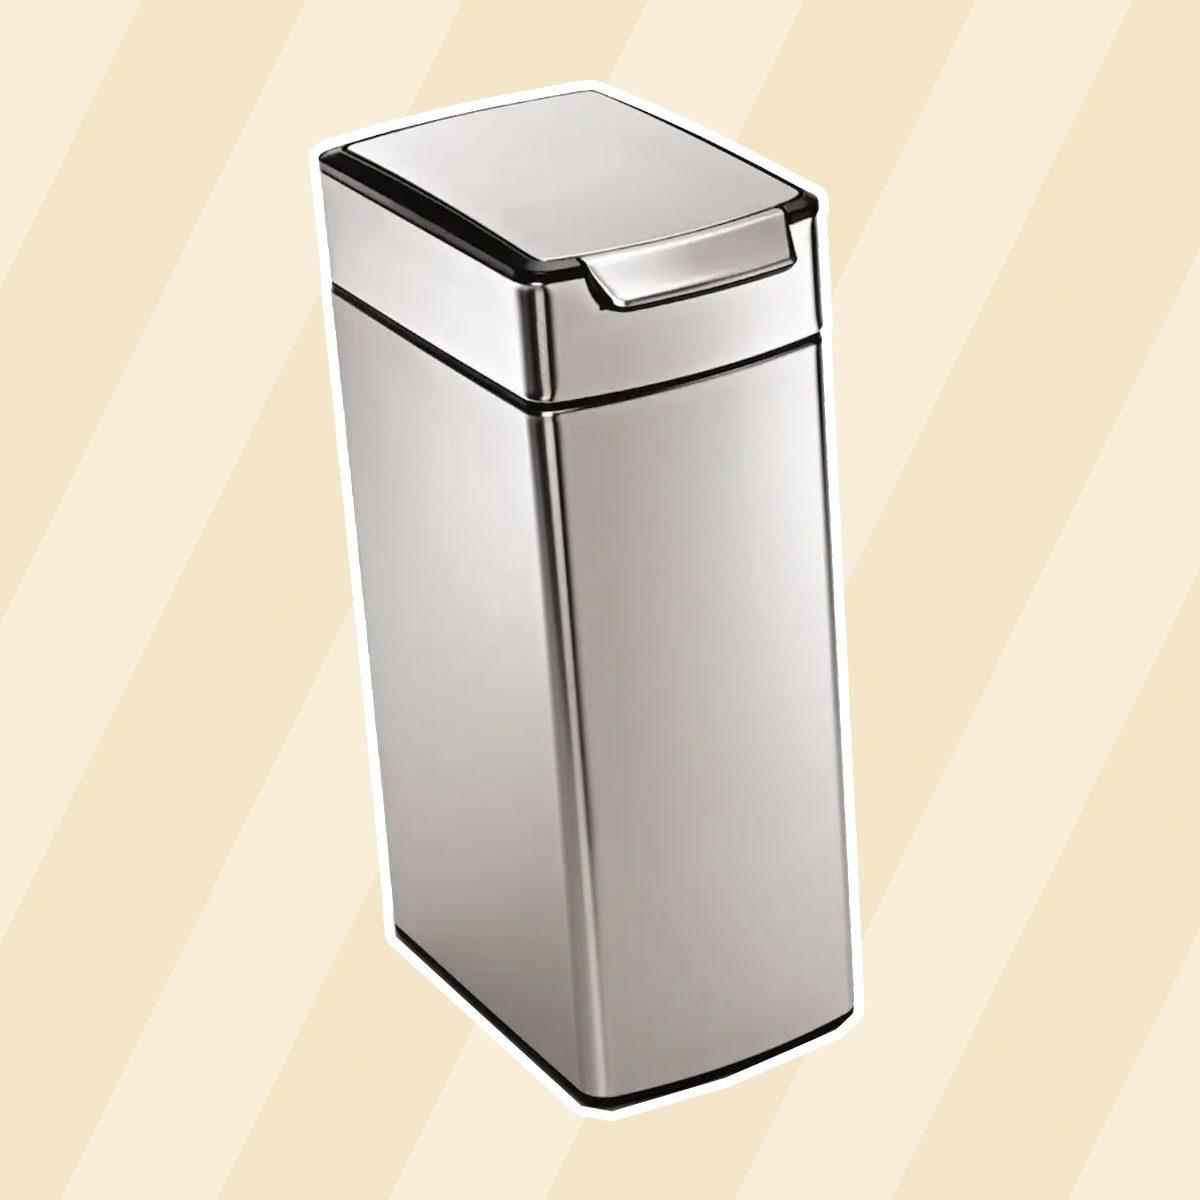 simplehuman 10.5-Gallon Slim Touch Bar Trash Can